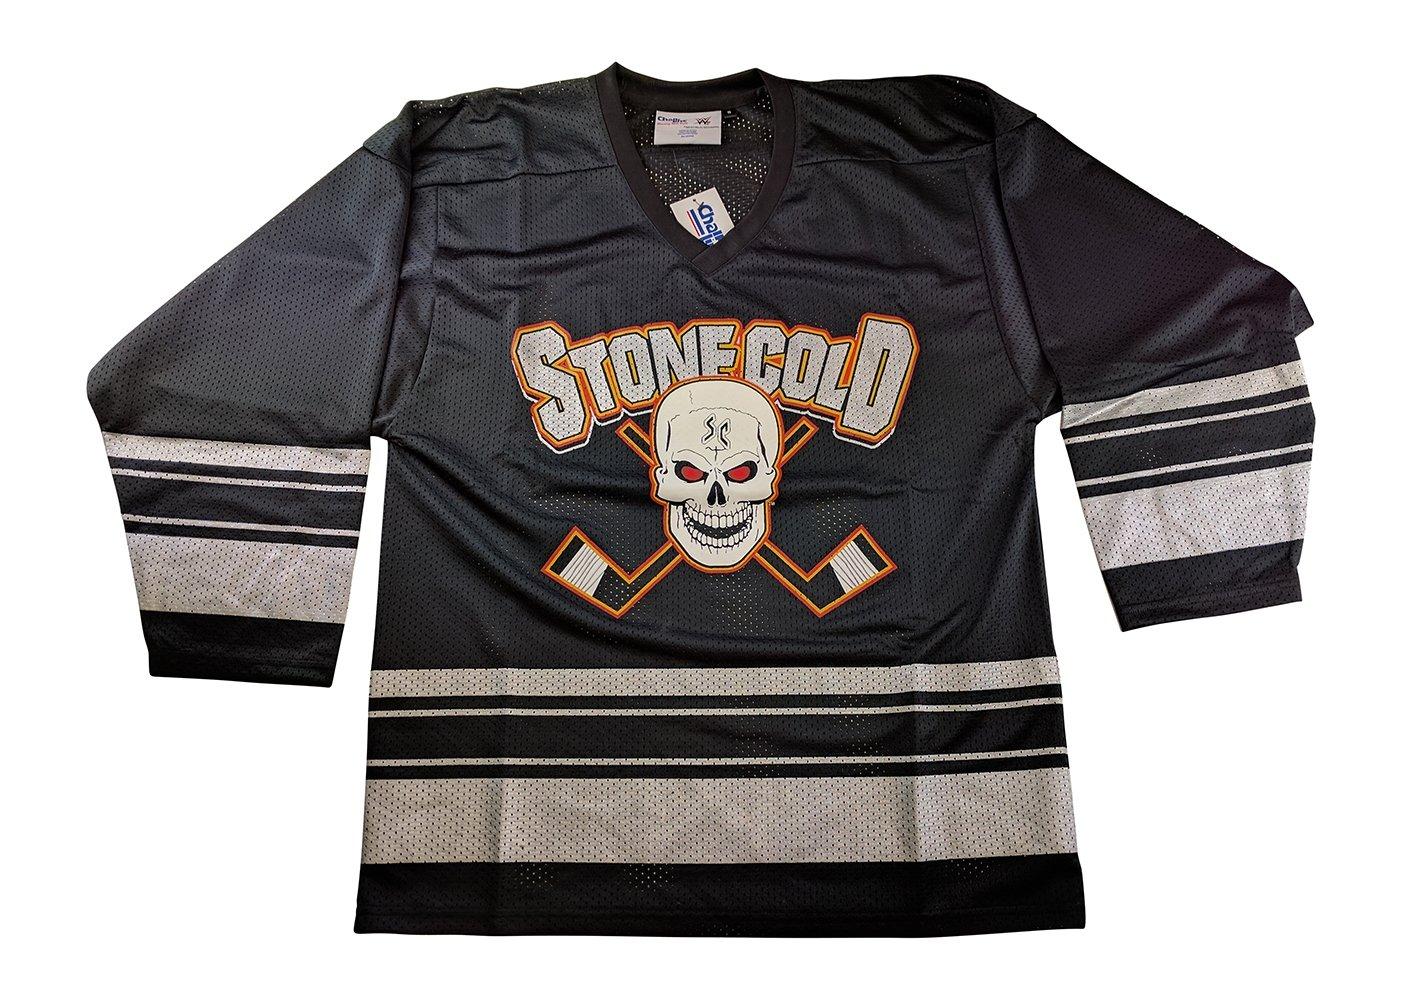 Stone Cold Steve Austin 3:16 Mens WWE Chalkline Hockey Jersey-M by Chalk Line